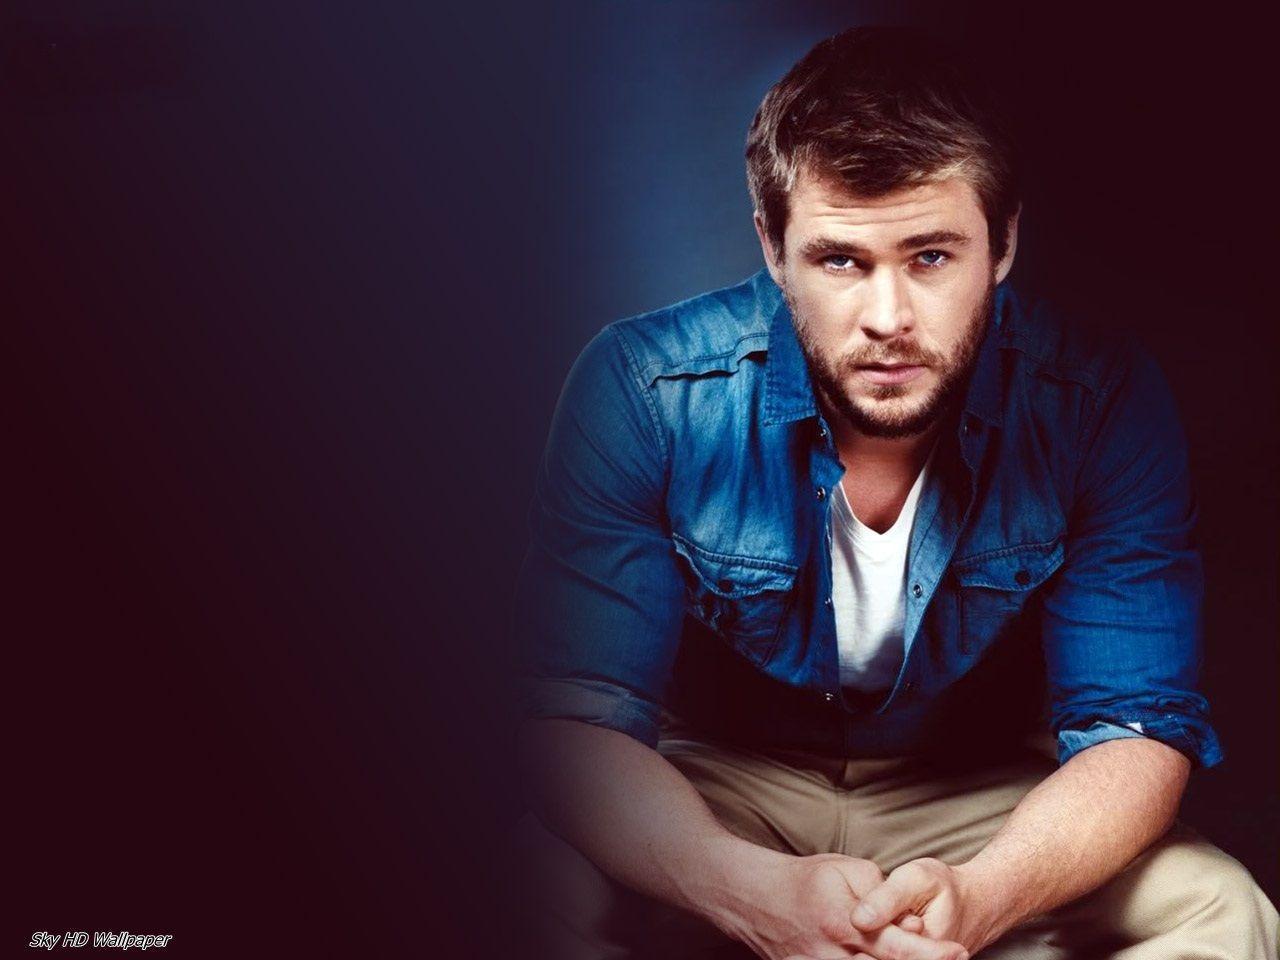 Chris Hemsworth Wallpapers 1280x960